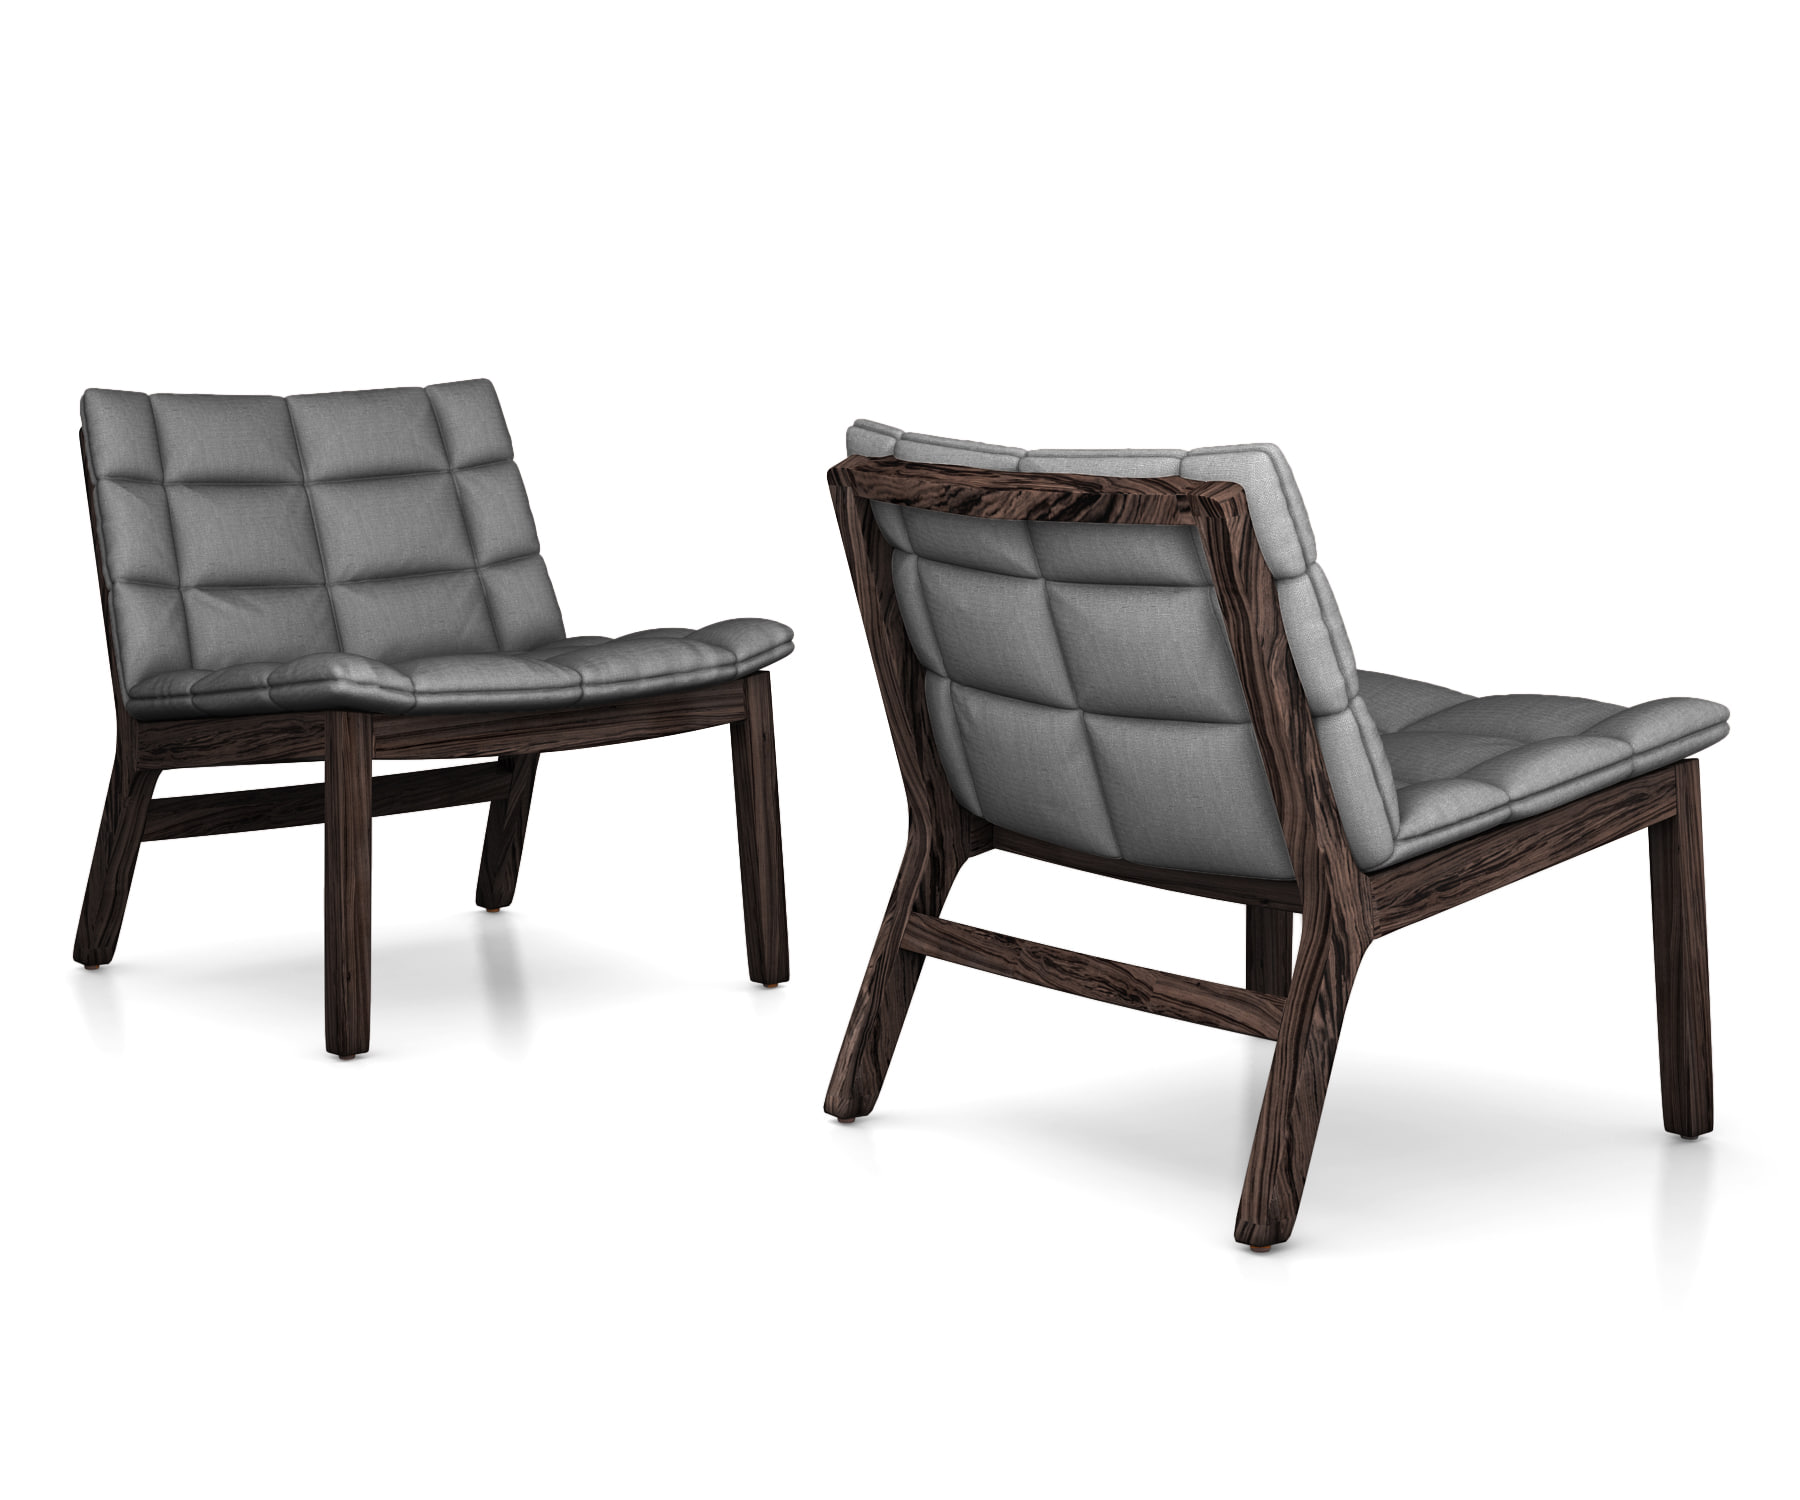 Wicket Lounge Chair By Blu Dot 3d Model 3d Model 3dhunt Co